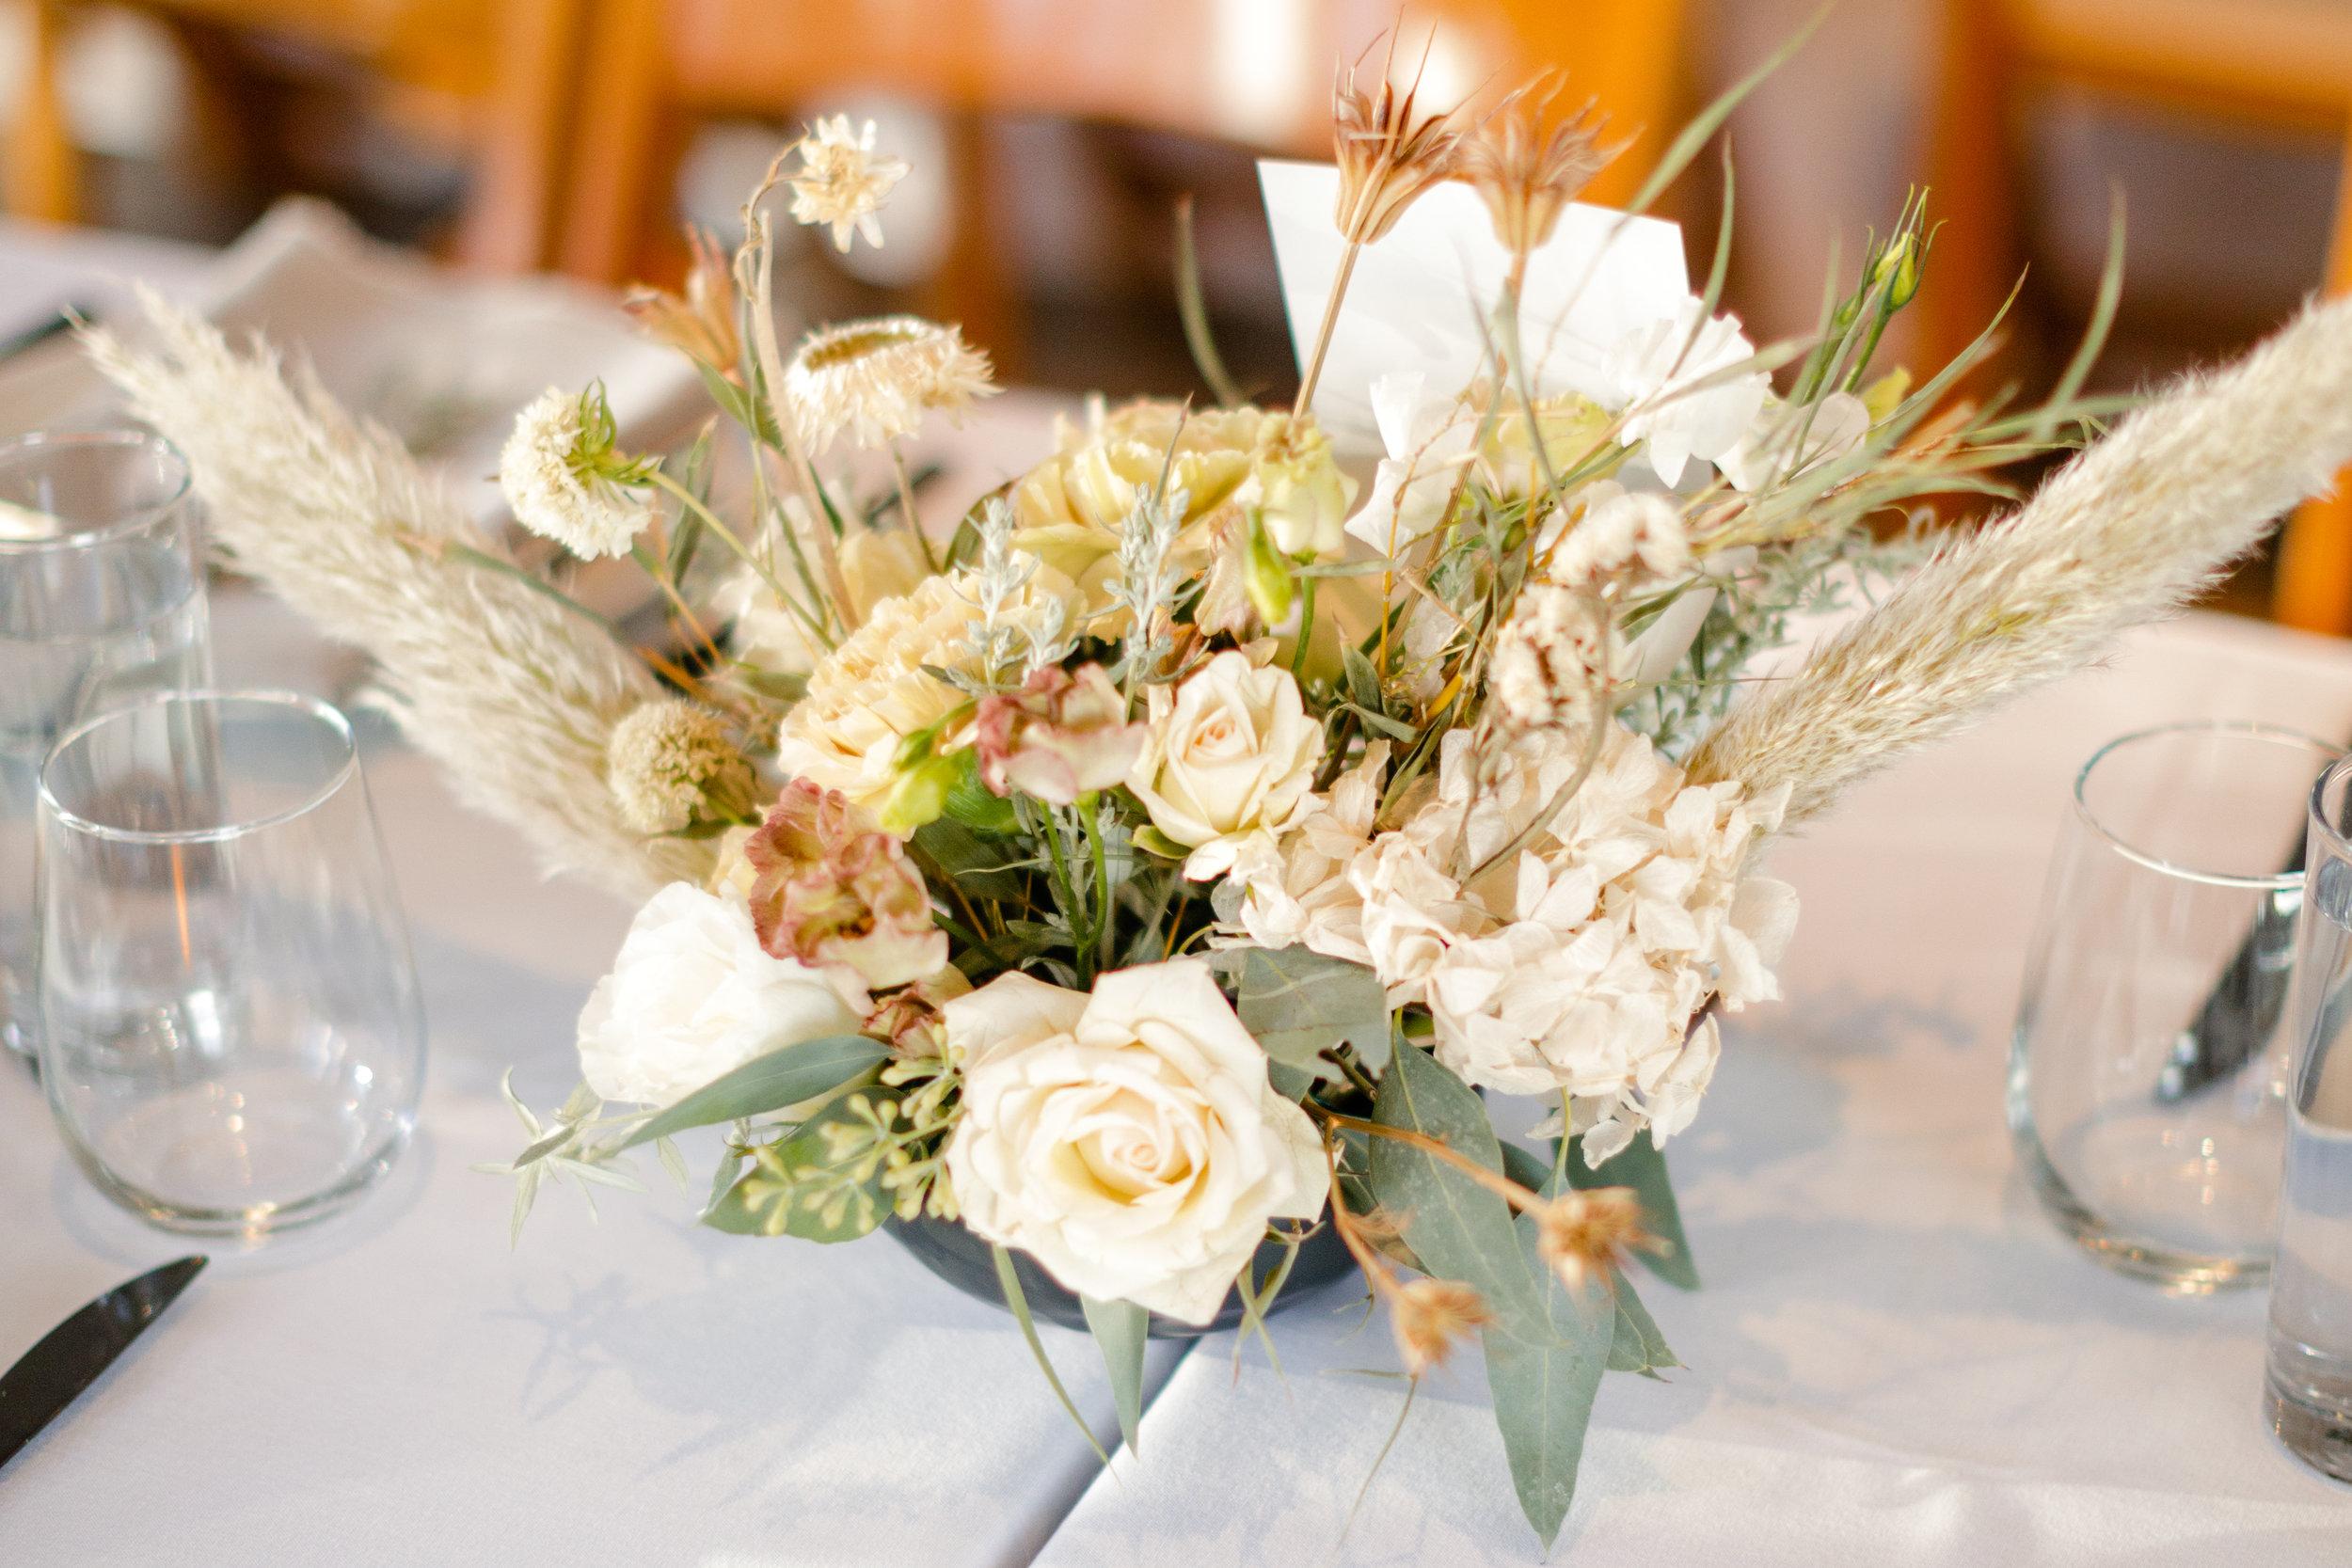 Dried_Flower_Wedding_Centerpiece_Sibyl_Sophia_Des_Moines_Iowa.jpg.jpg